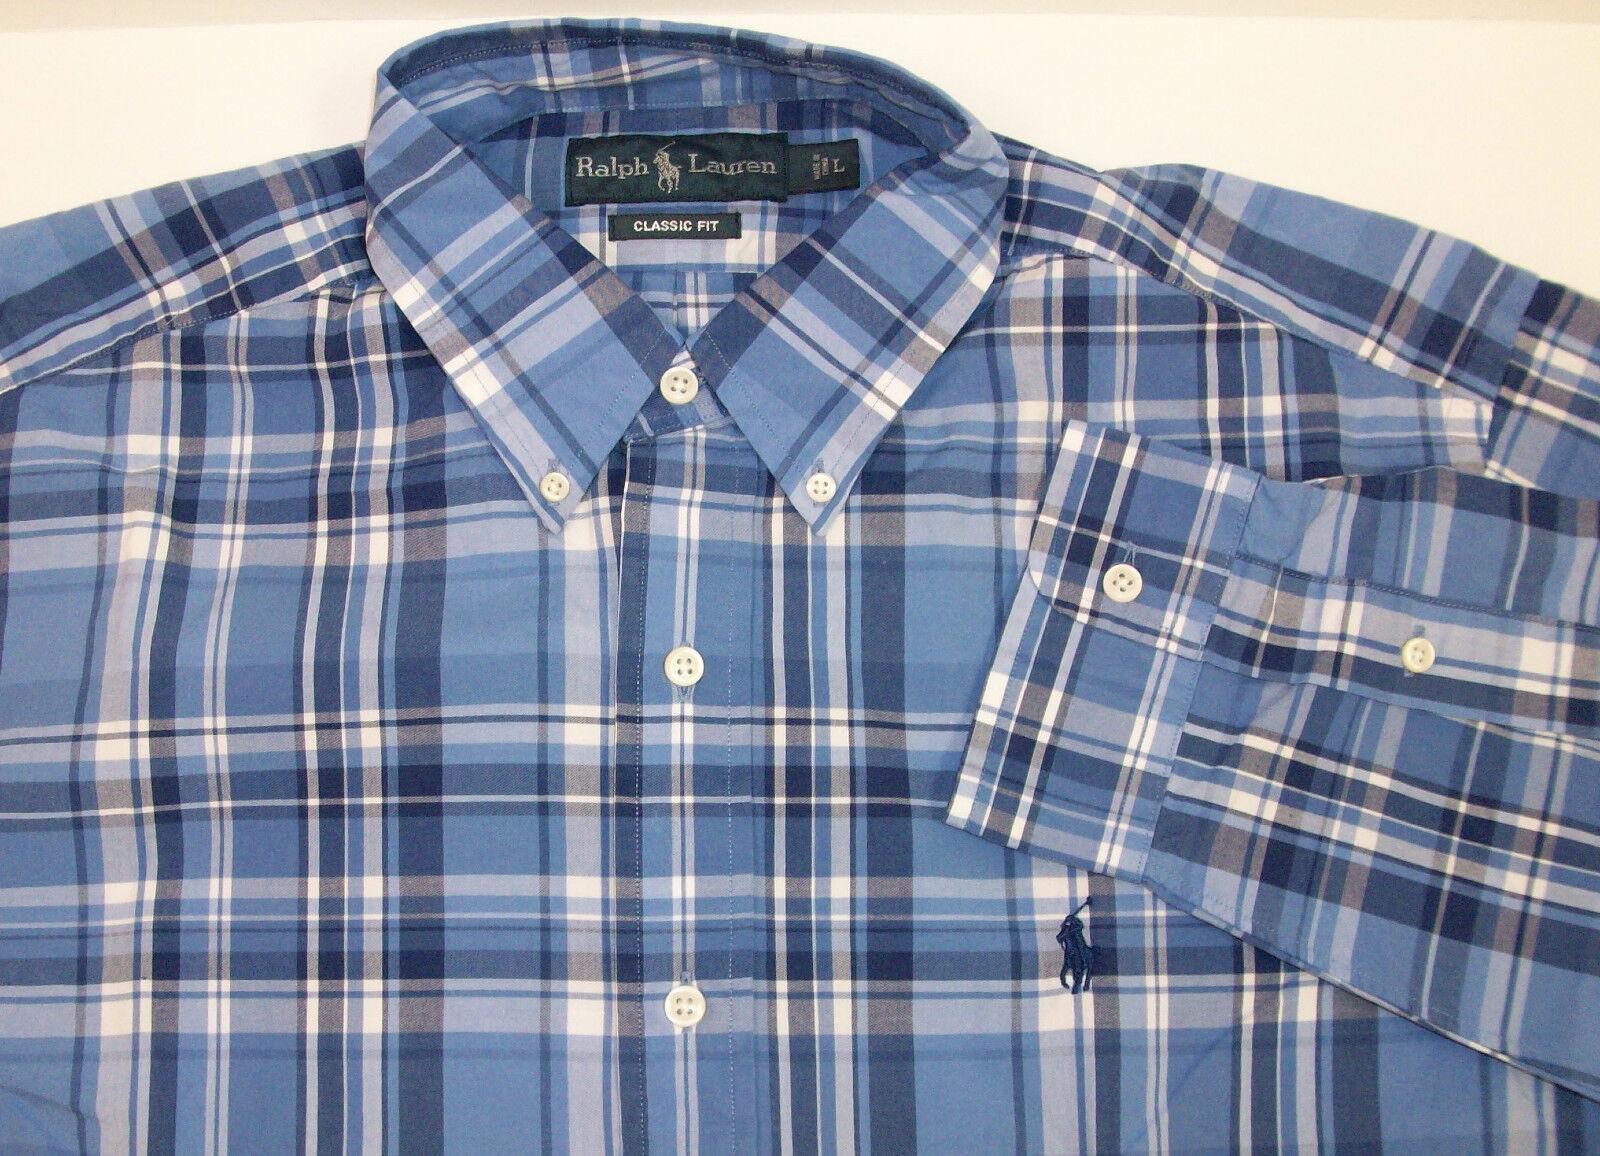 Polo Ralph Lauren Classic Fit Woven Plaid LS Shirt bluee White -95 W  Pony NWT